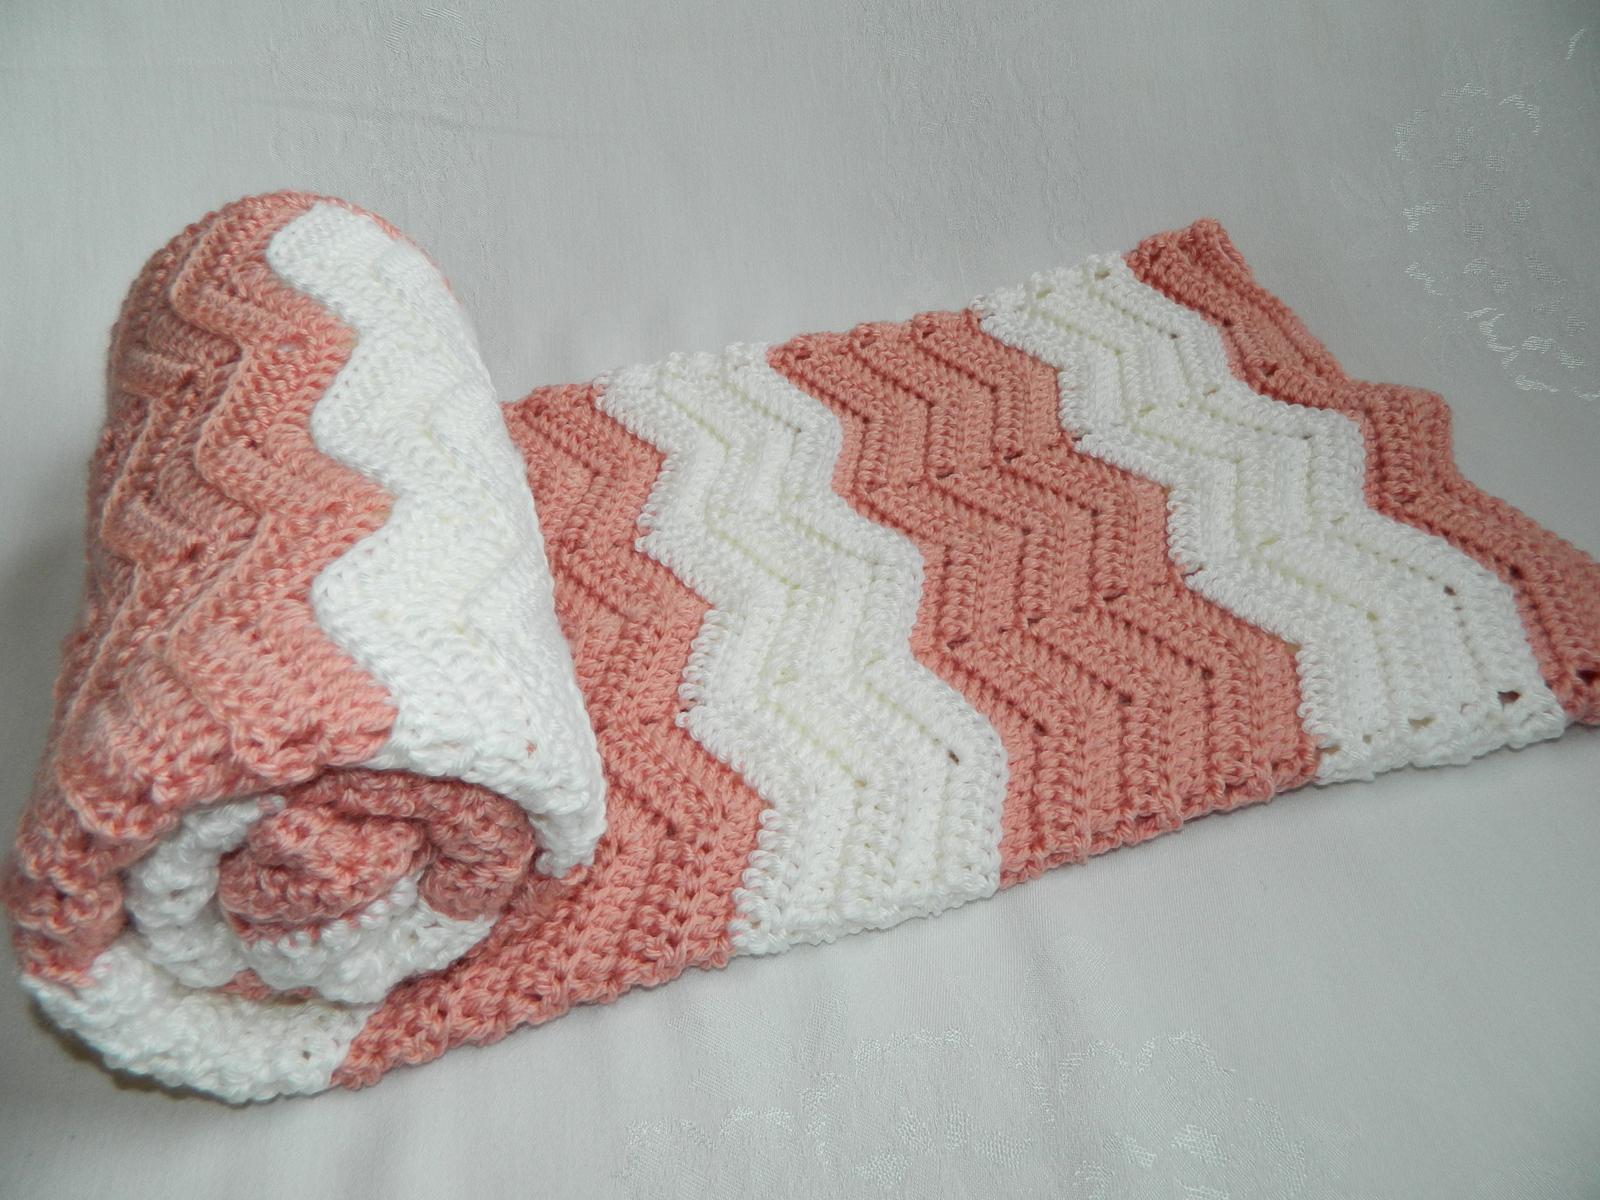 wavy ripple crib blanket afghan soft peach white bernat softee baby yarn 33 x 40